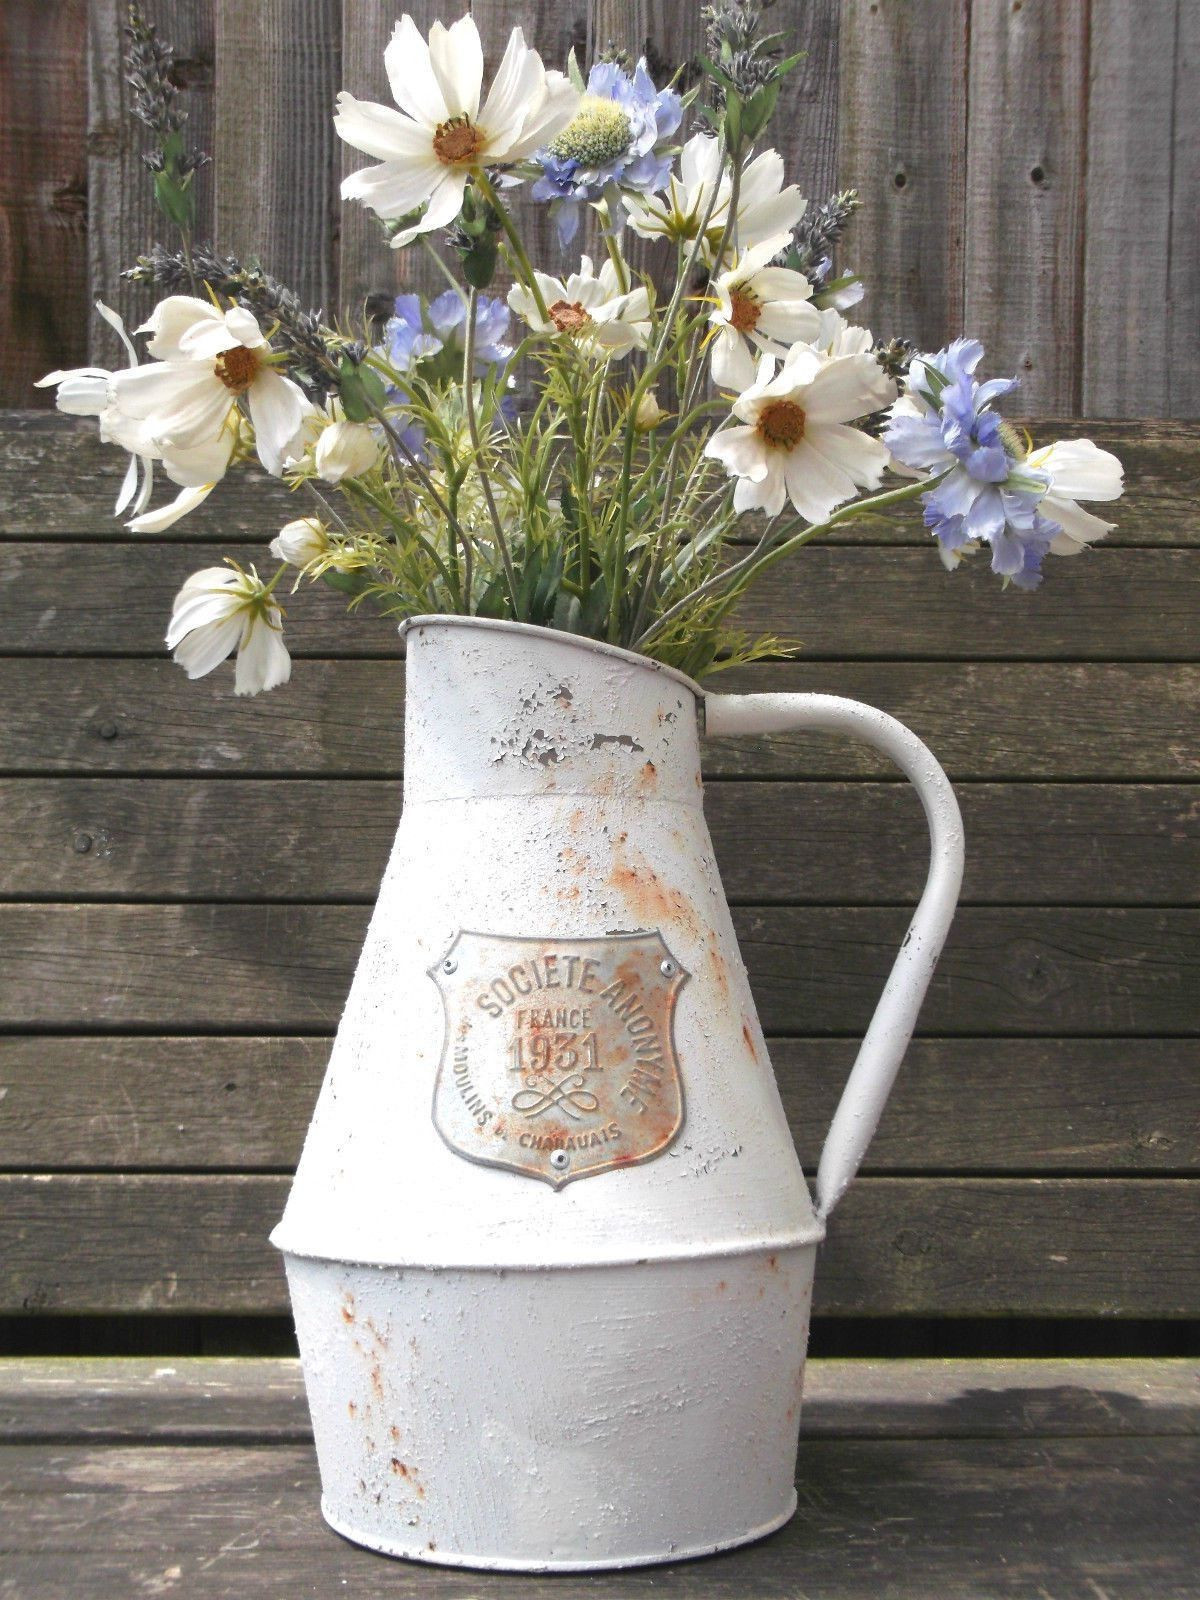 26 Great Antique Bronze Vase 2021 free download antique bronze vase of 30 copper flower vase the weekly world inside french flower bucket h vases galvanized french vase tin bucketi 0d